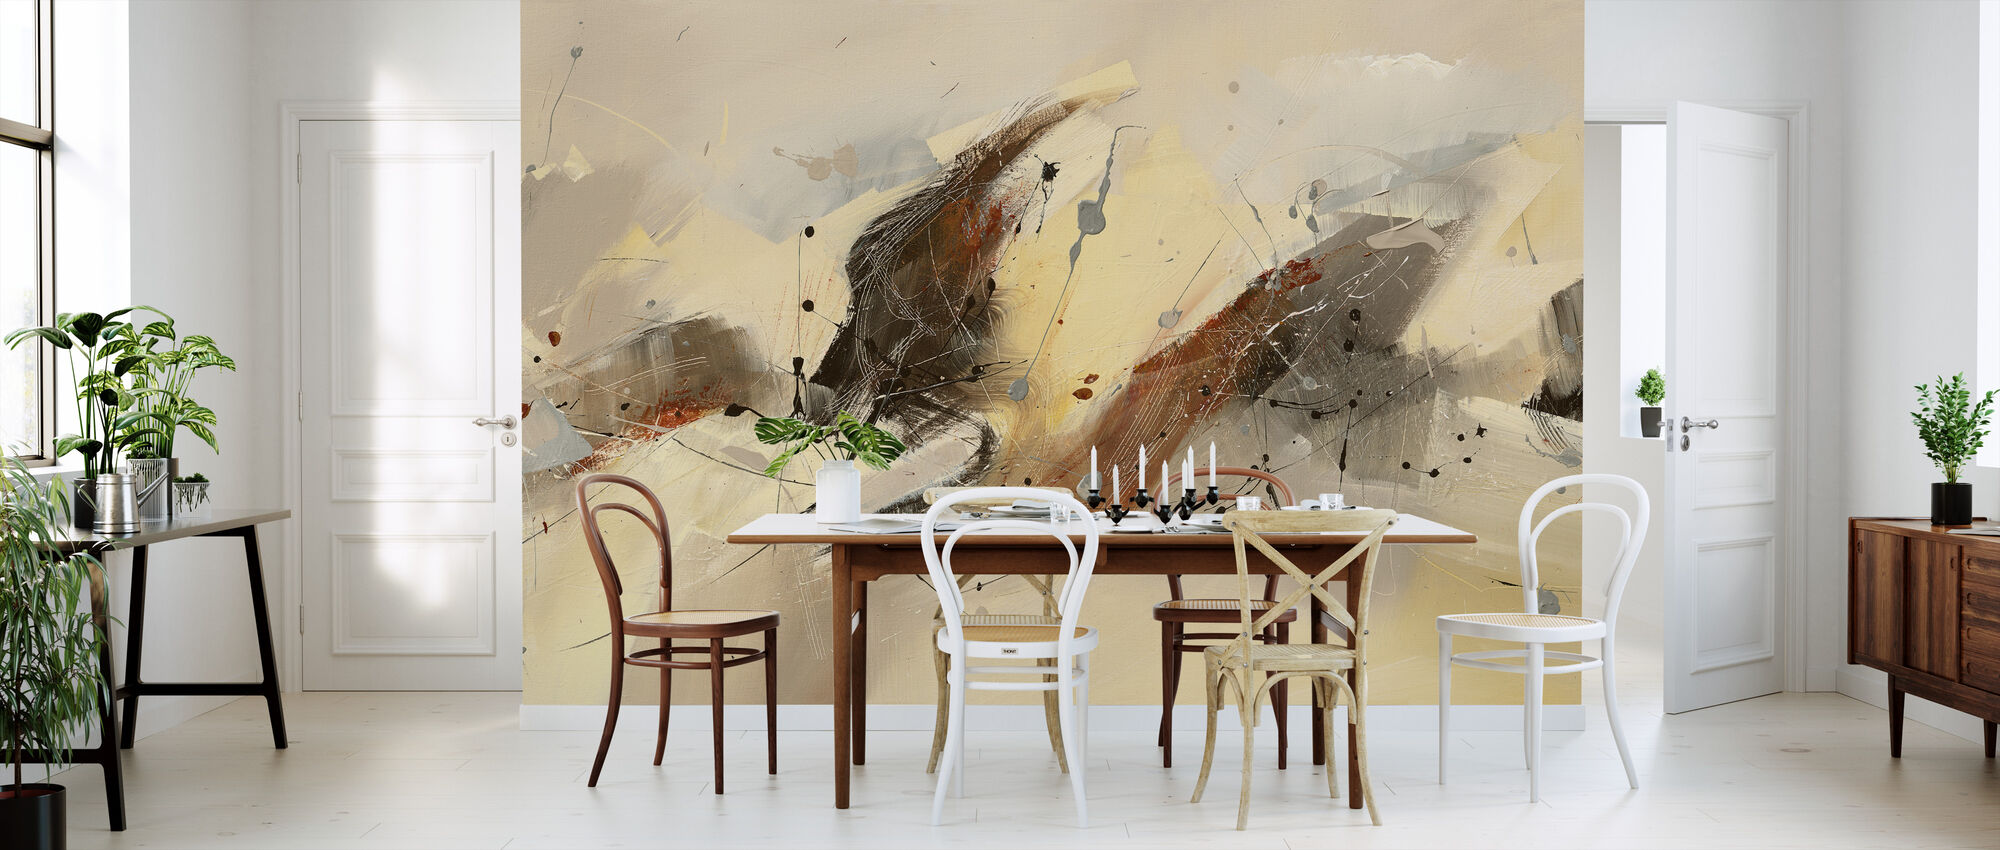 Farandole - Wallpaper - Kitchen